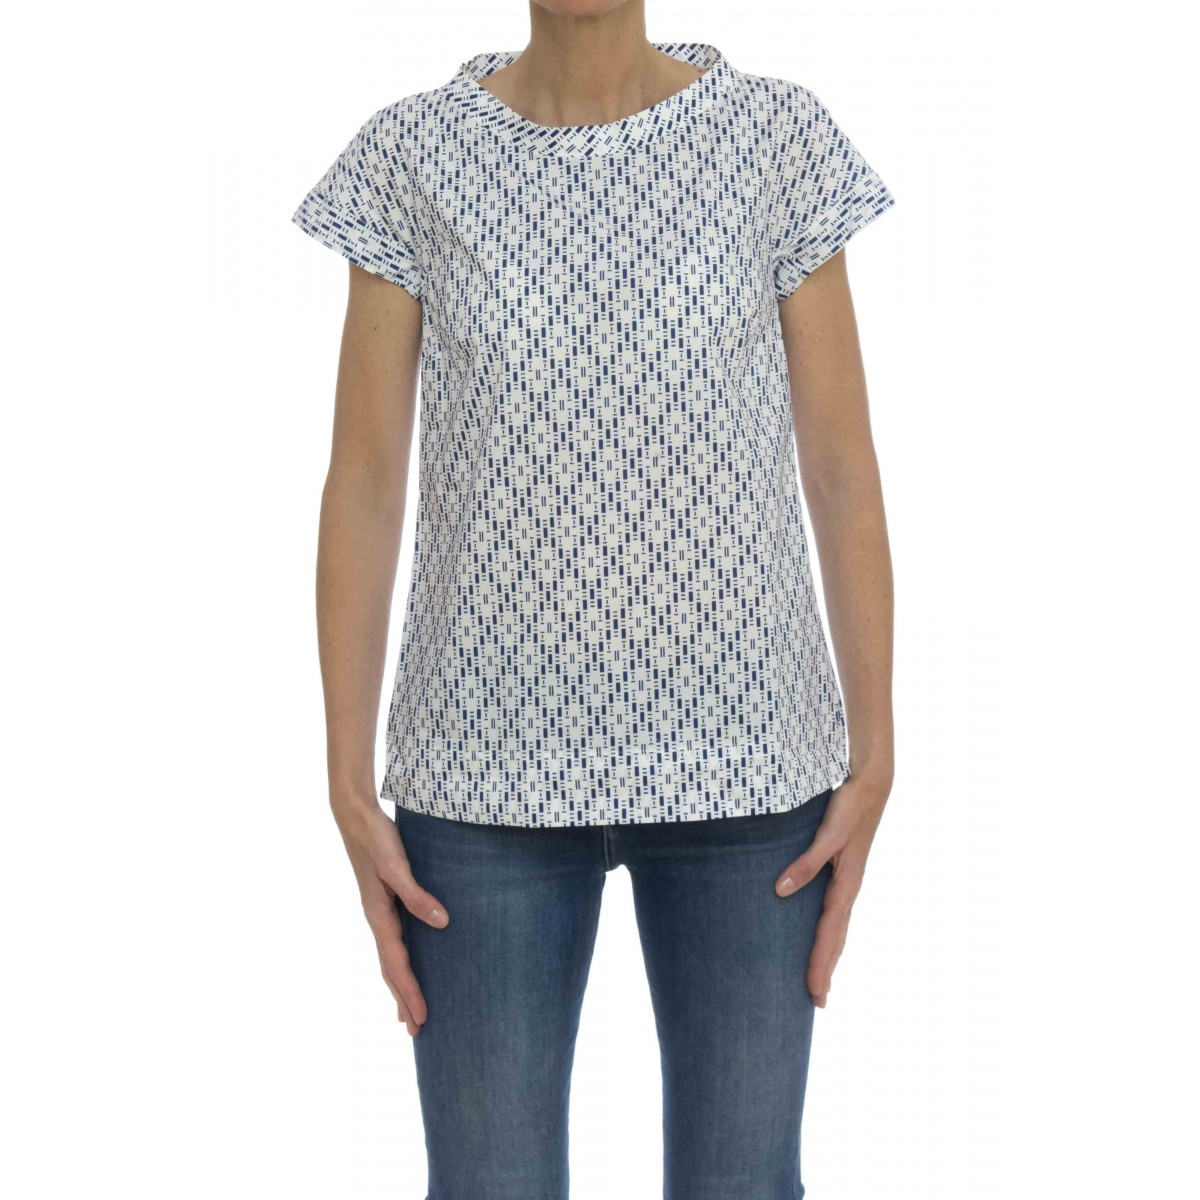 Camicia donna - Rnr zyt